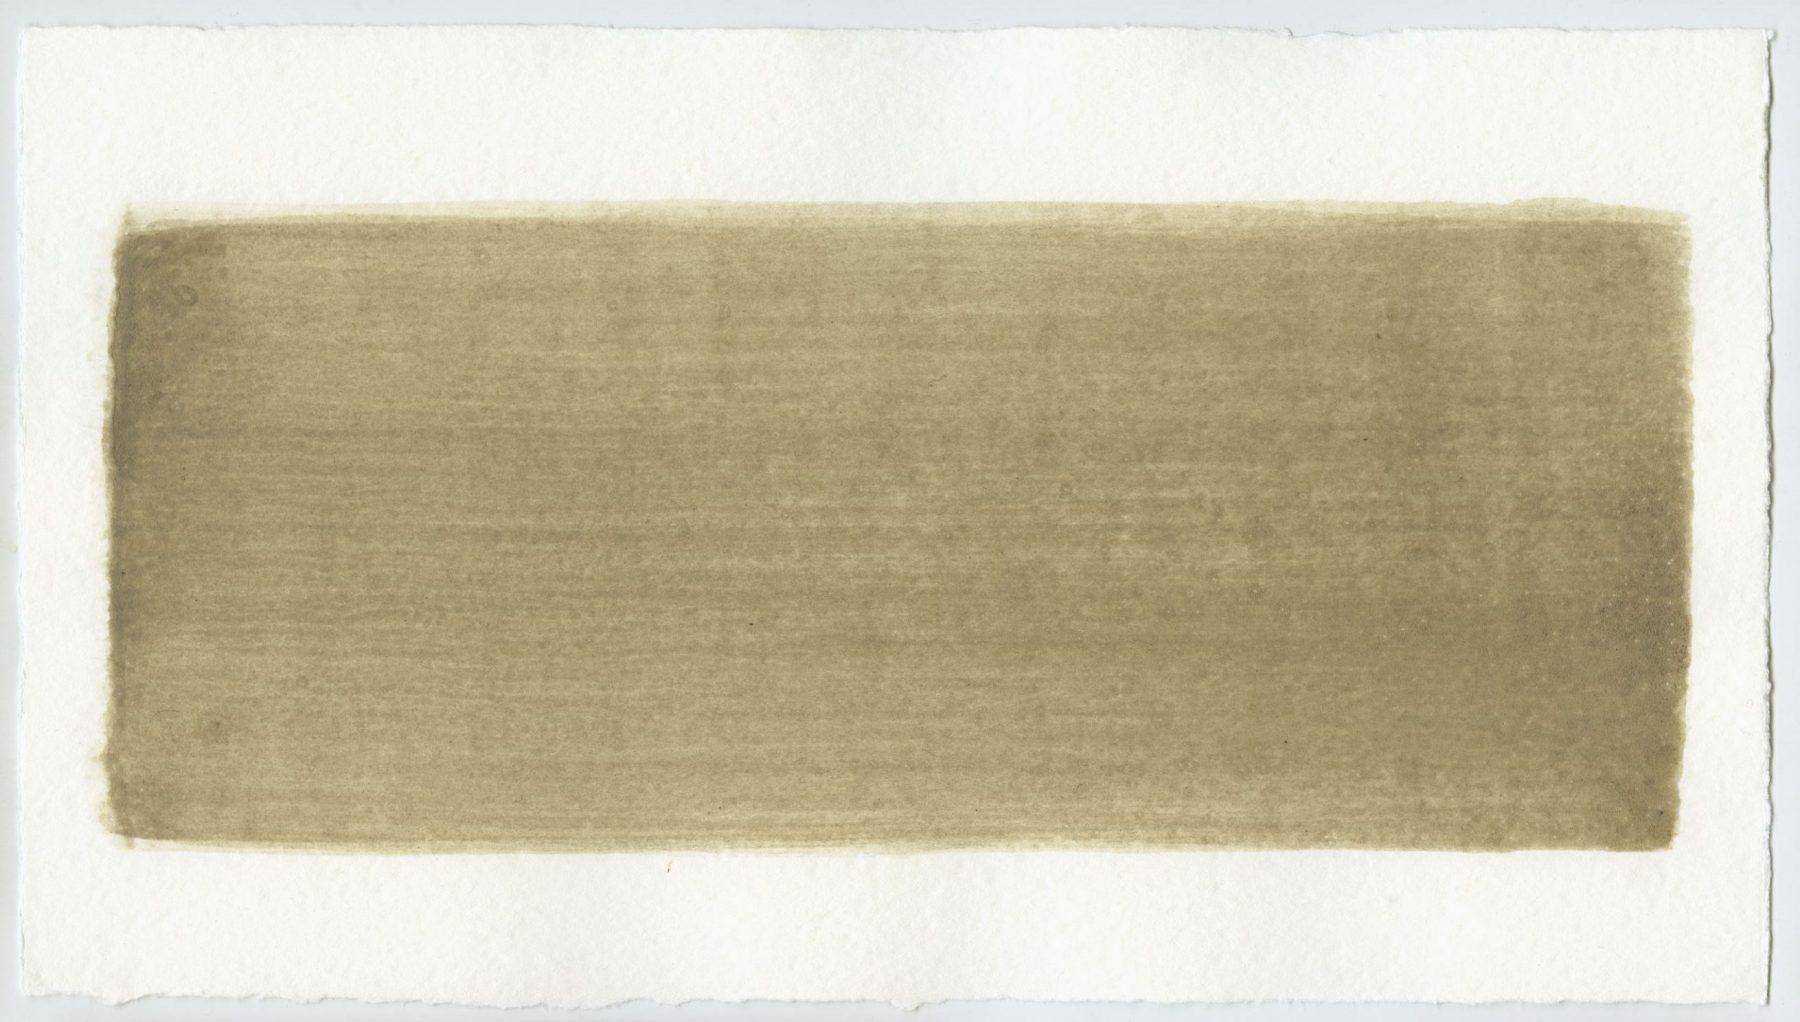 No. 13 PEREKKER GRIJS GEBRAND - clay [burnt no. 11, 1260°C] - 04 December 2018 51° 35.838'N 5° 41.080'E